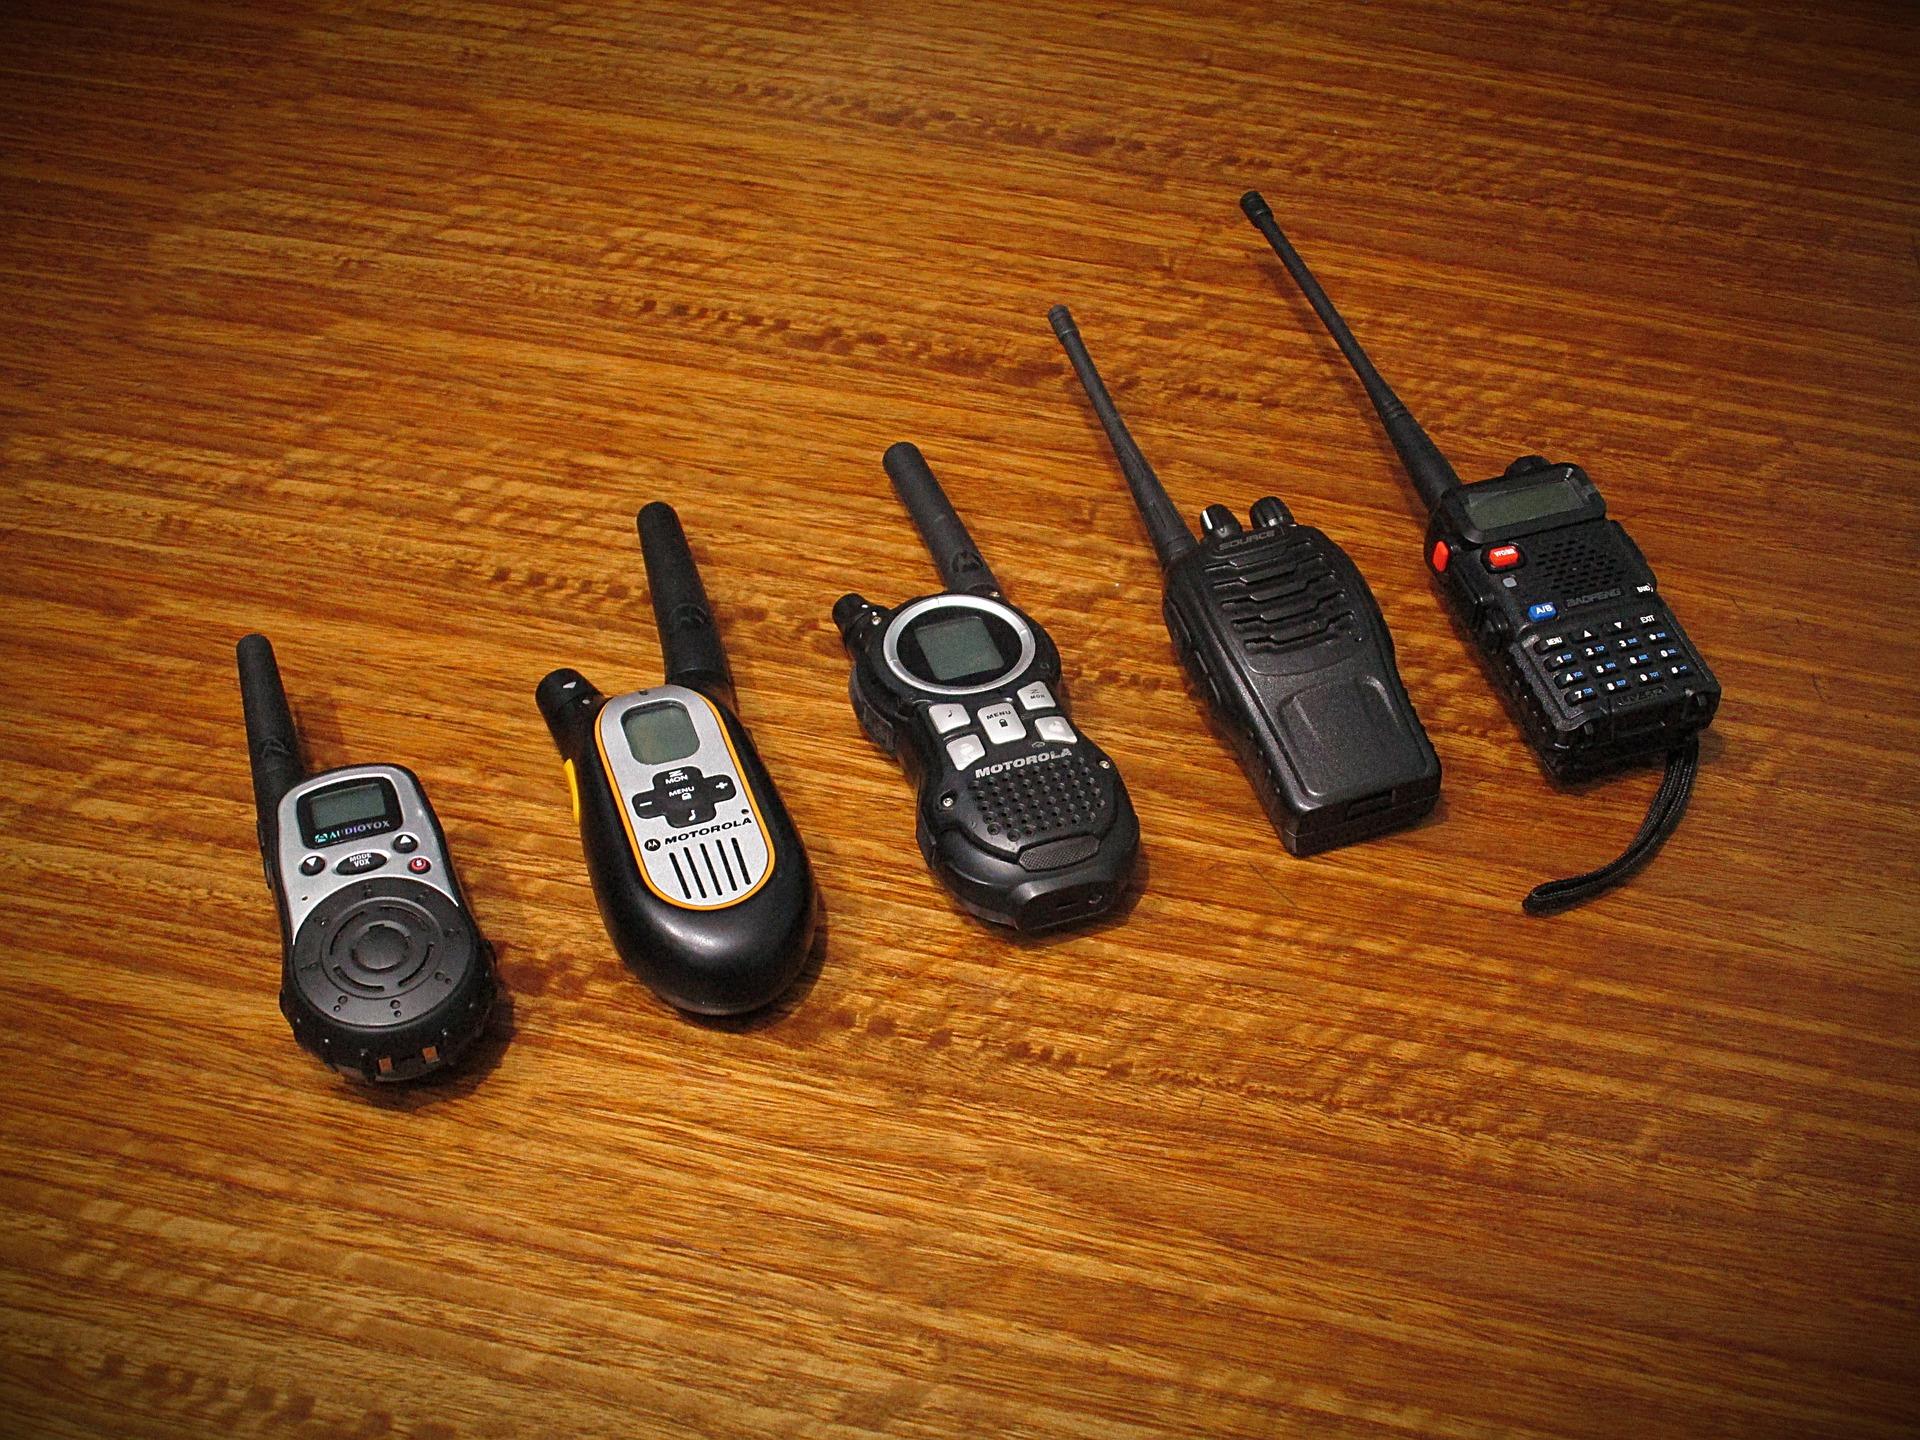 https://pixabay.com/ja/ラジオ-通信-周波数-モバイル-電気通信-アンテナ-1224721/